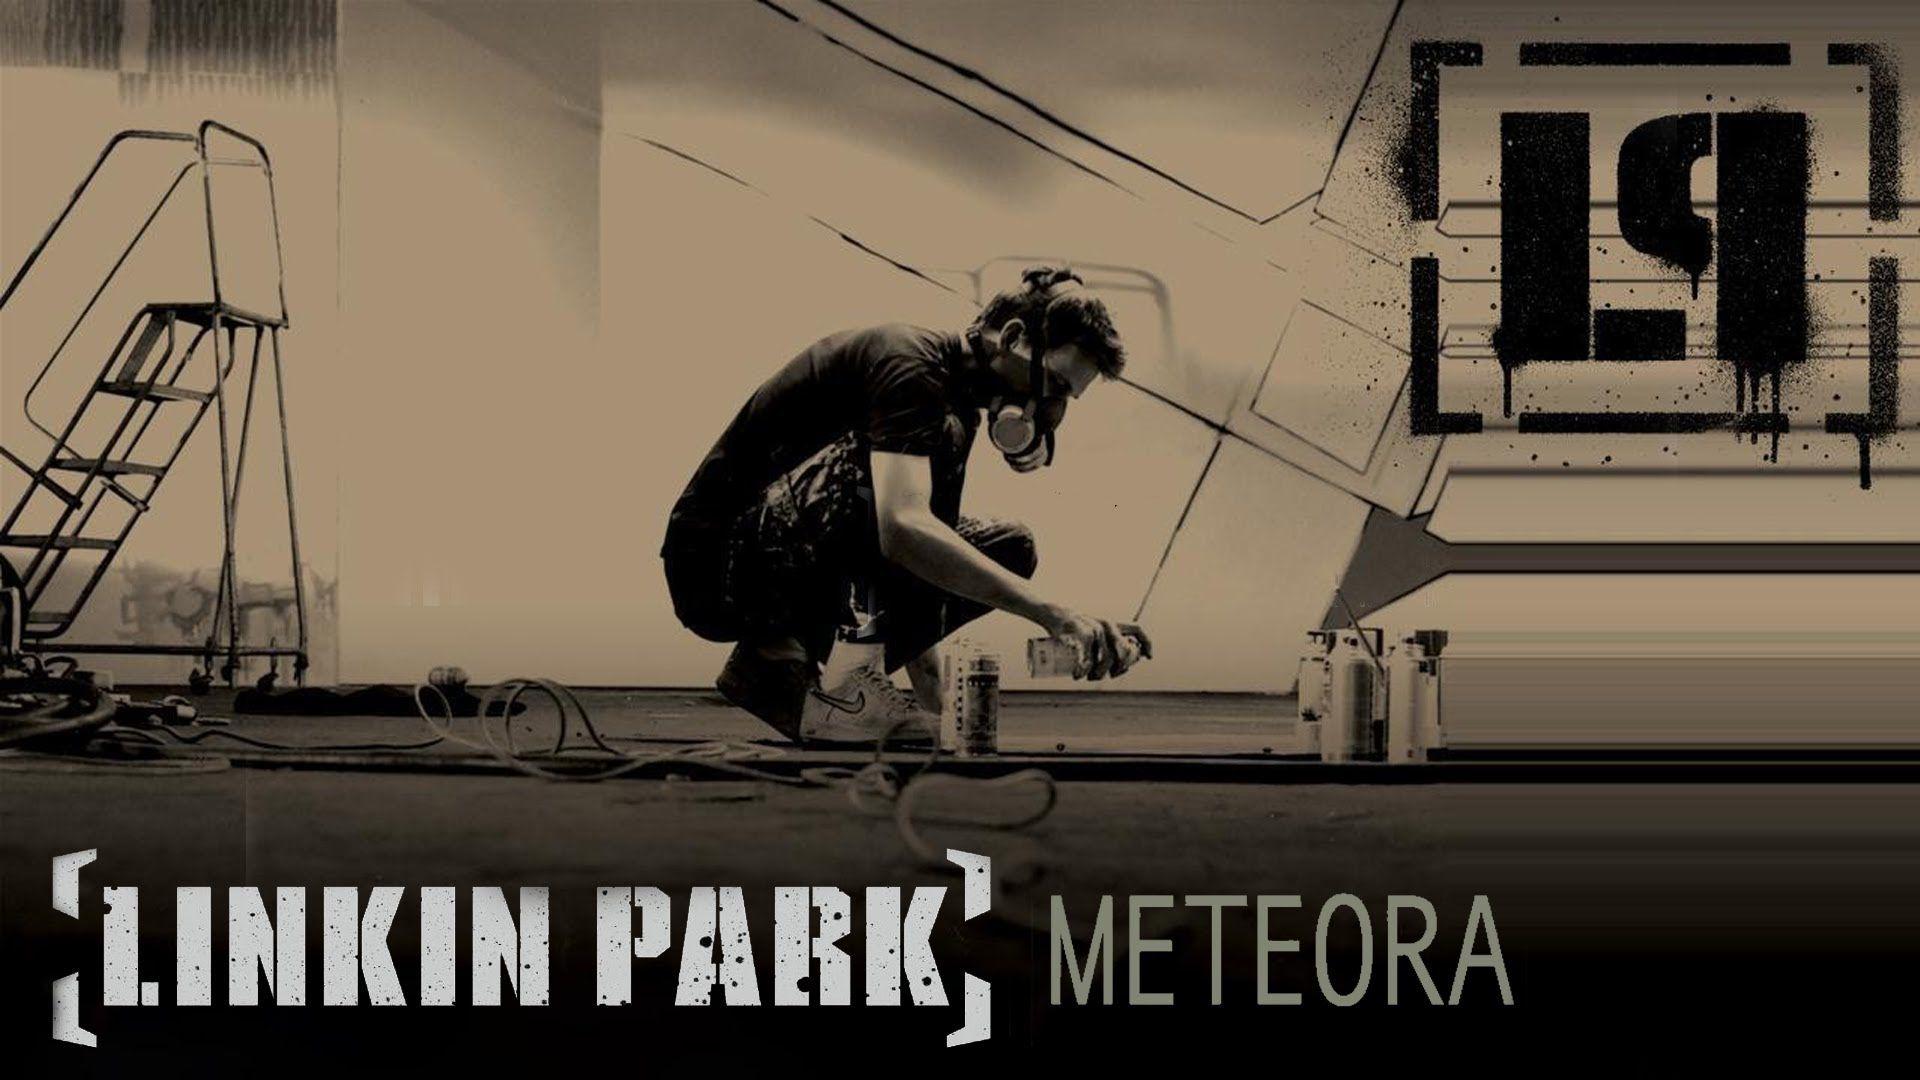 Google themes linkin park - Linkin Park Meteora Wallpaper Android Jpg 1920 1080